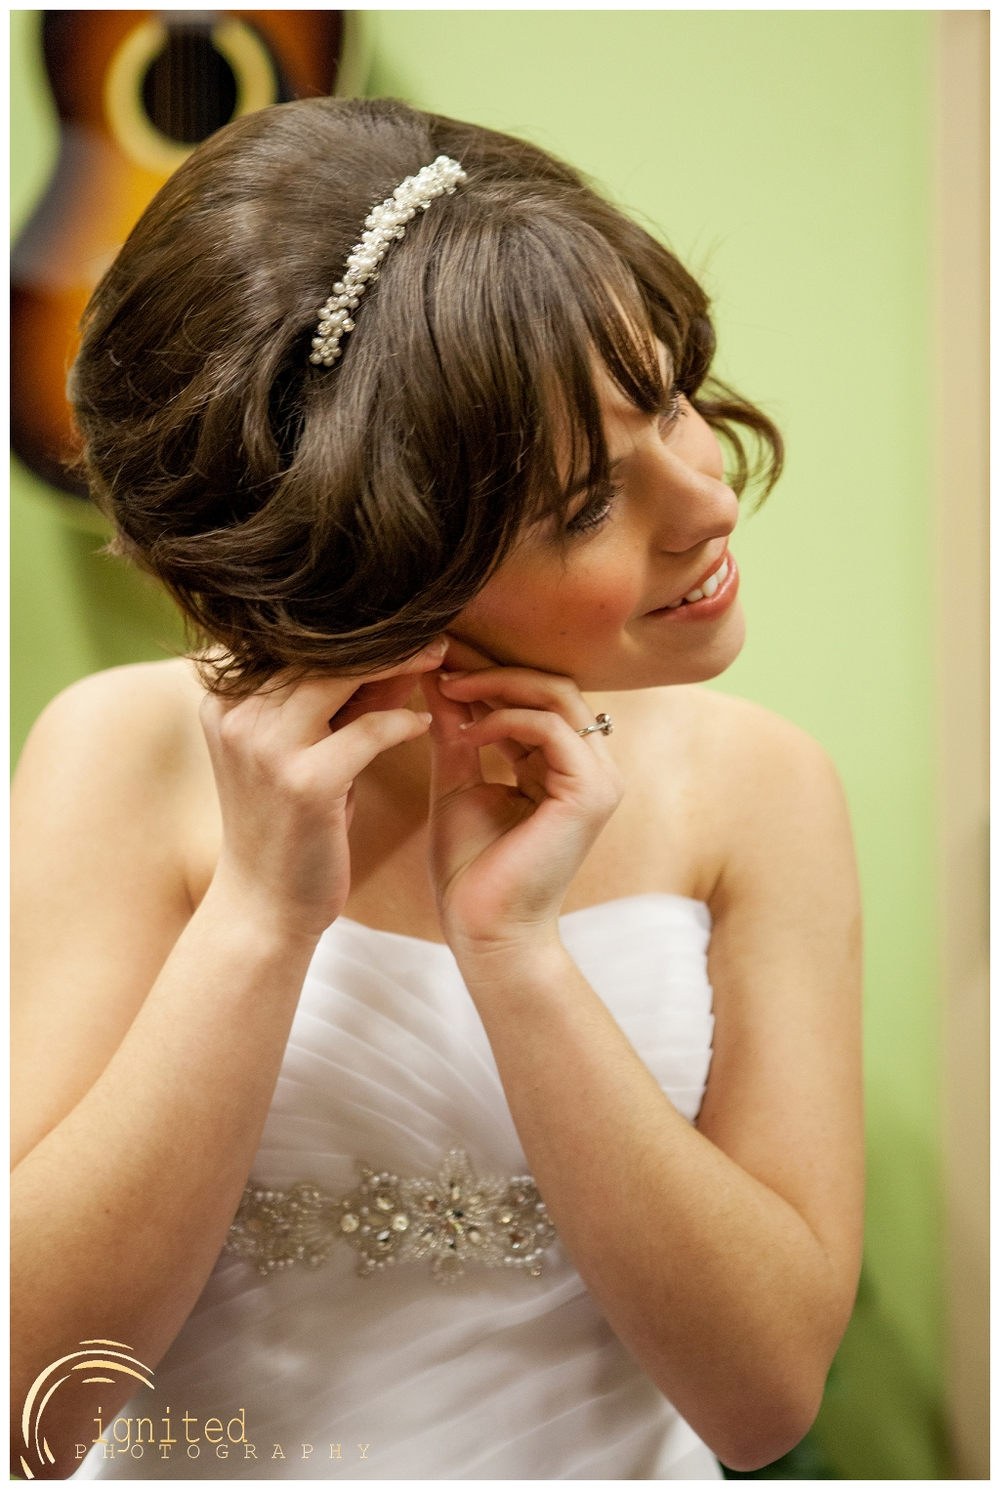 ignited Photography Alyssa  Castwell and Caleb Merna Wedding Brighton Nazarene The Naz Howell MI_0017.jpg